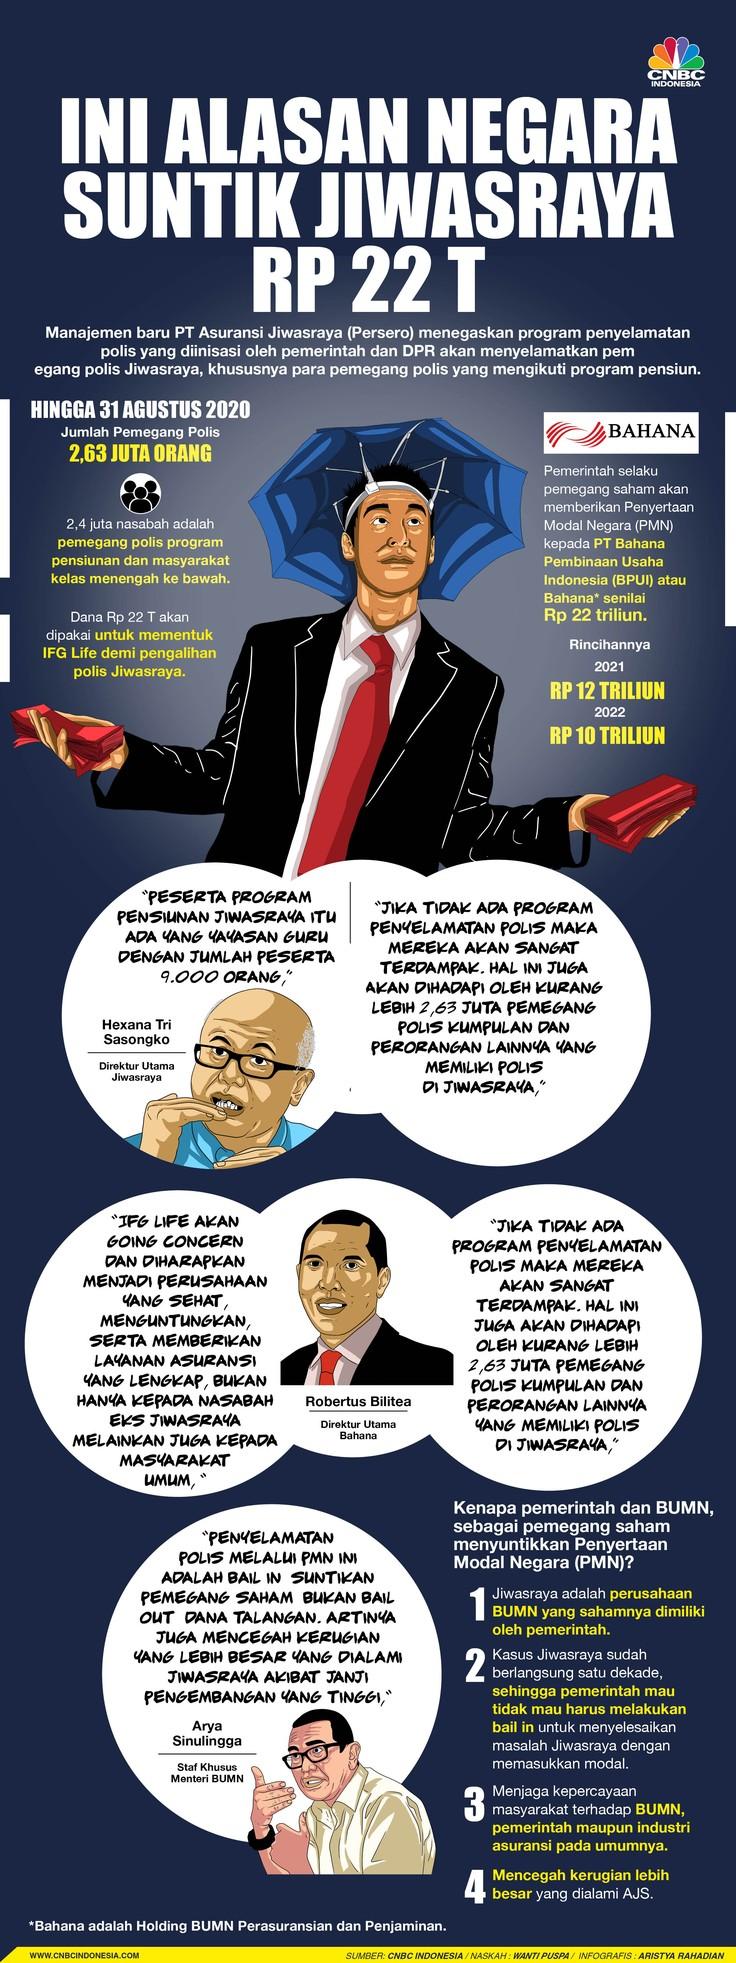 Infografis/Ini Alasan Negara Suntik Jiwasrayan Rp/Aristya Rahadian